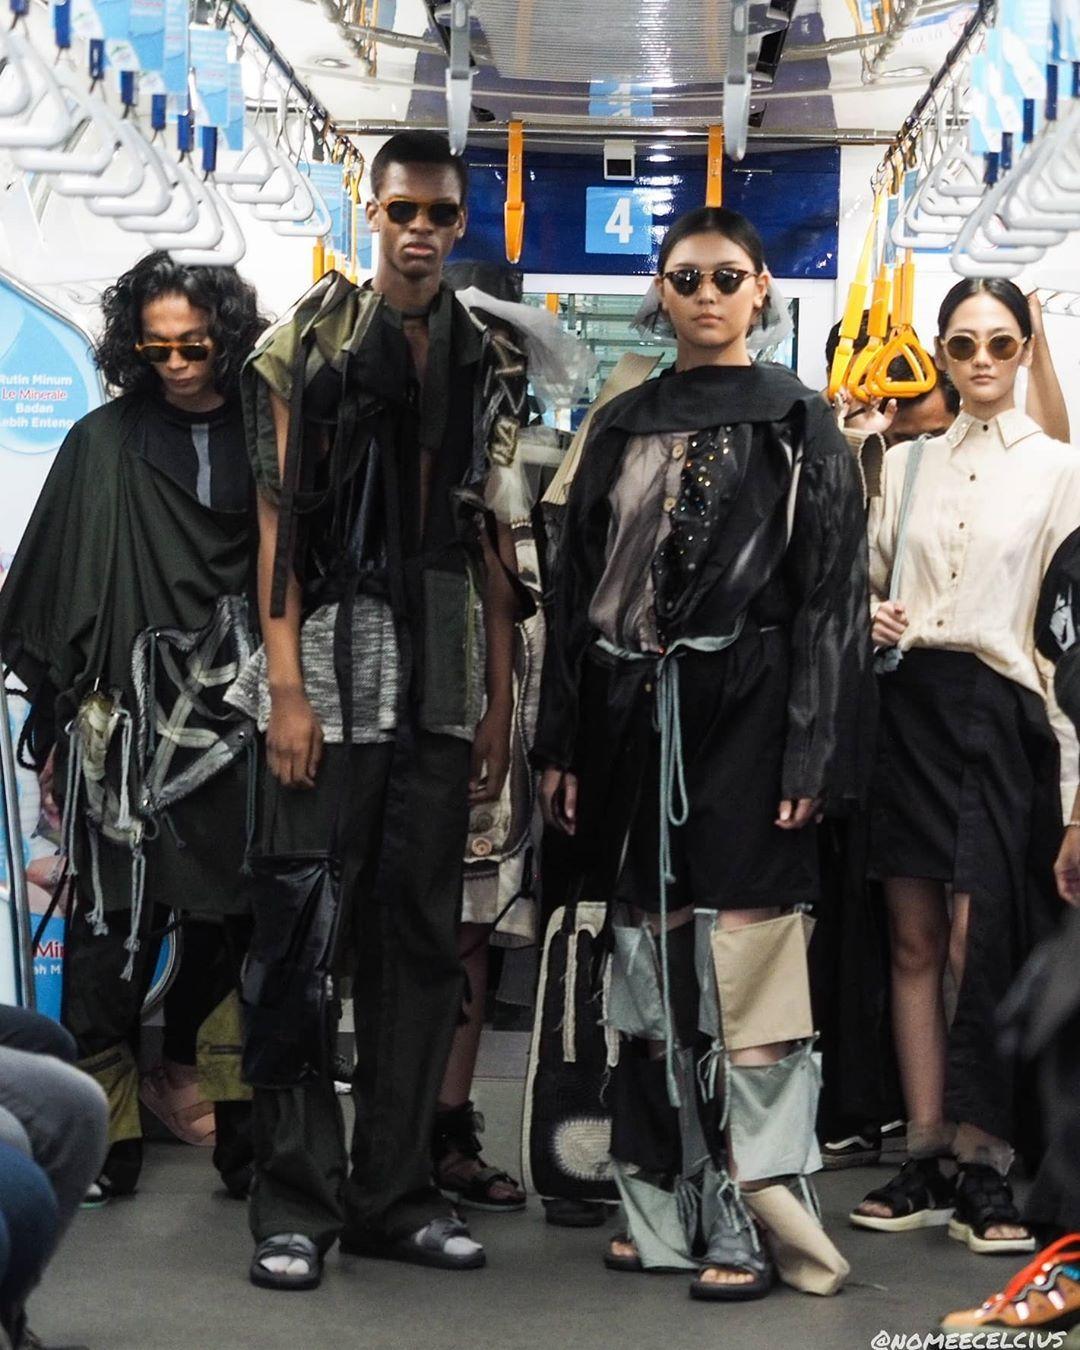 Uniknya Fashion Rocks 2020: Peragaan Busana Pertama di MRT Jakarta